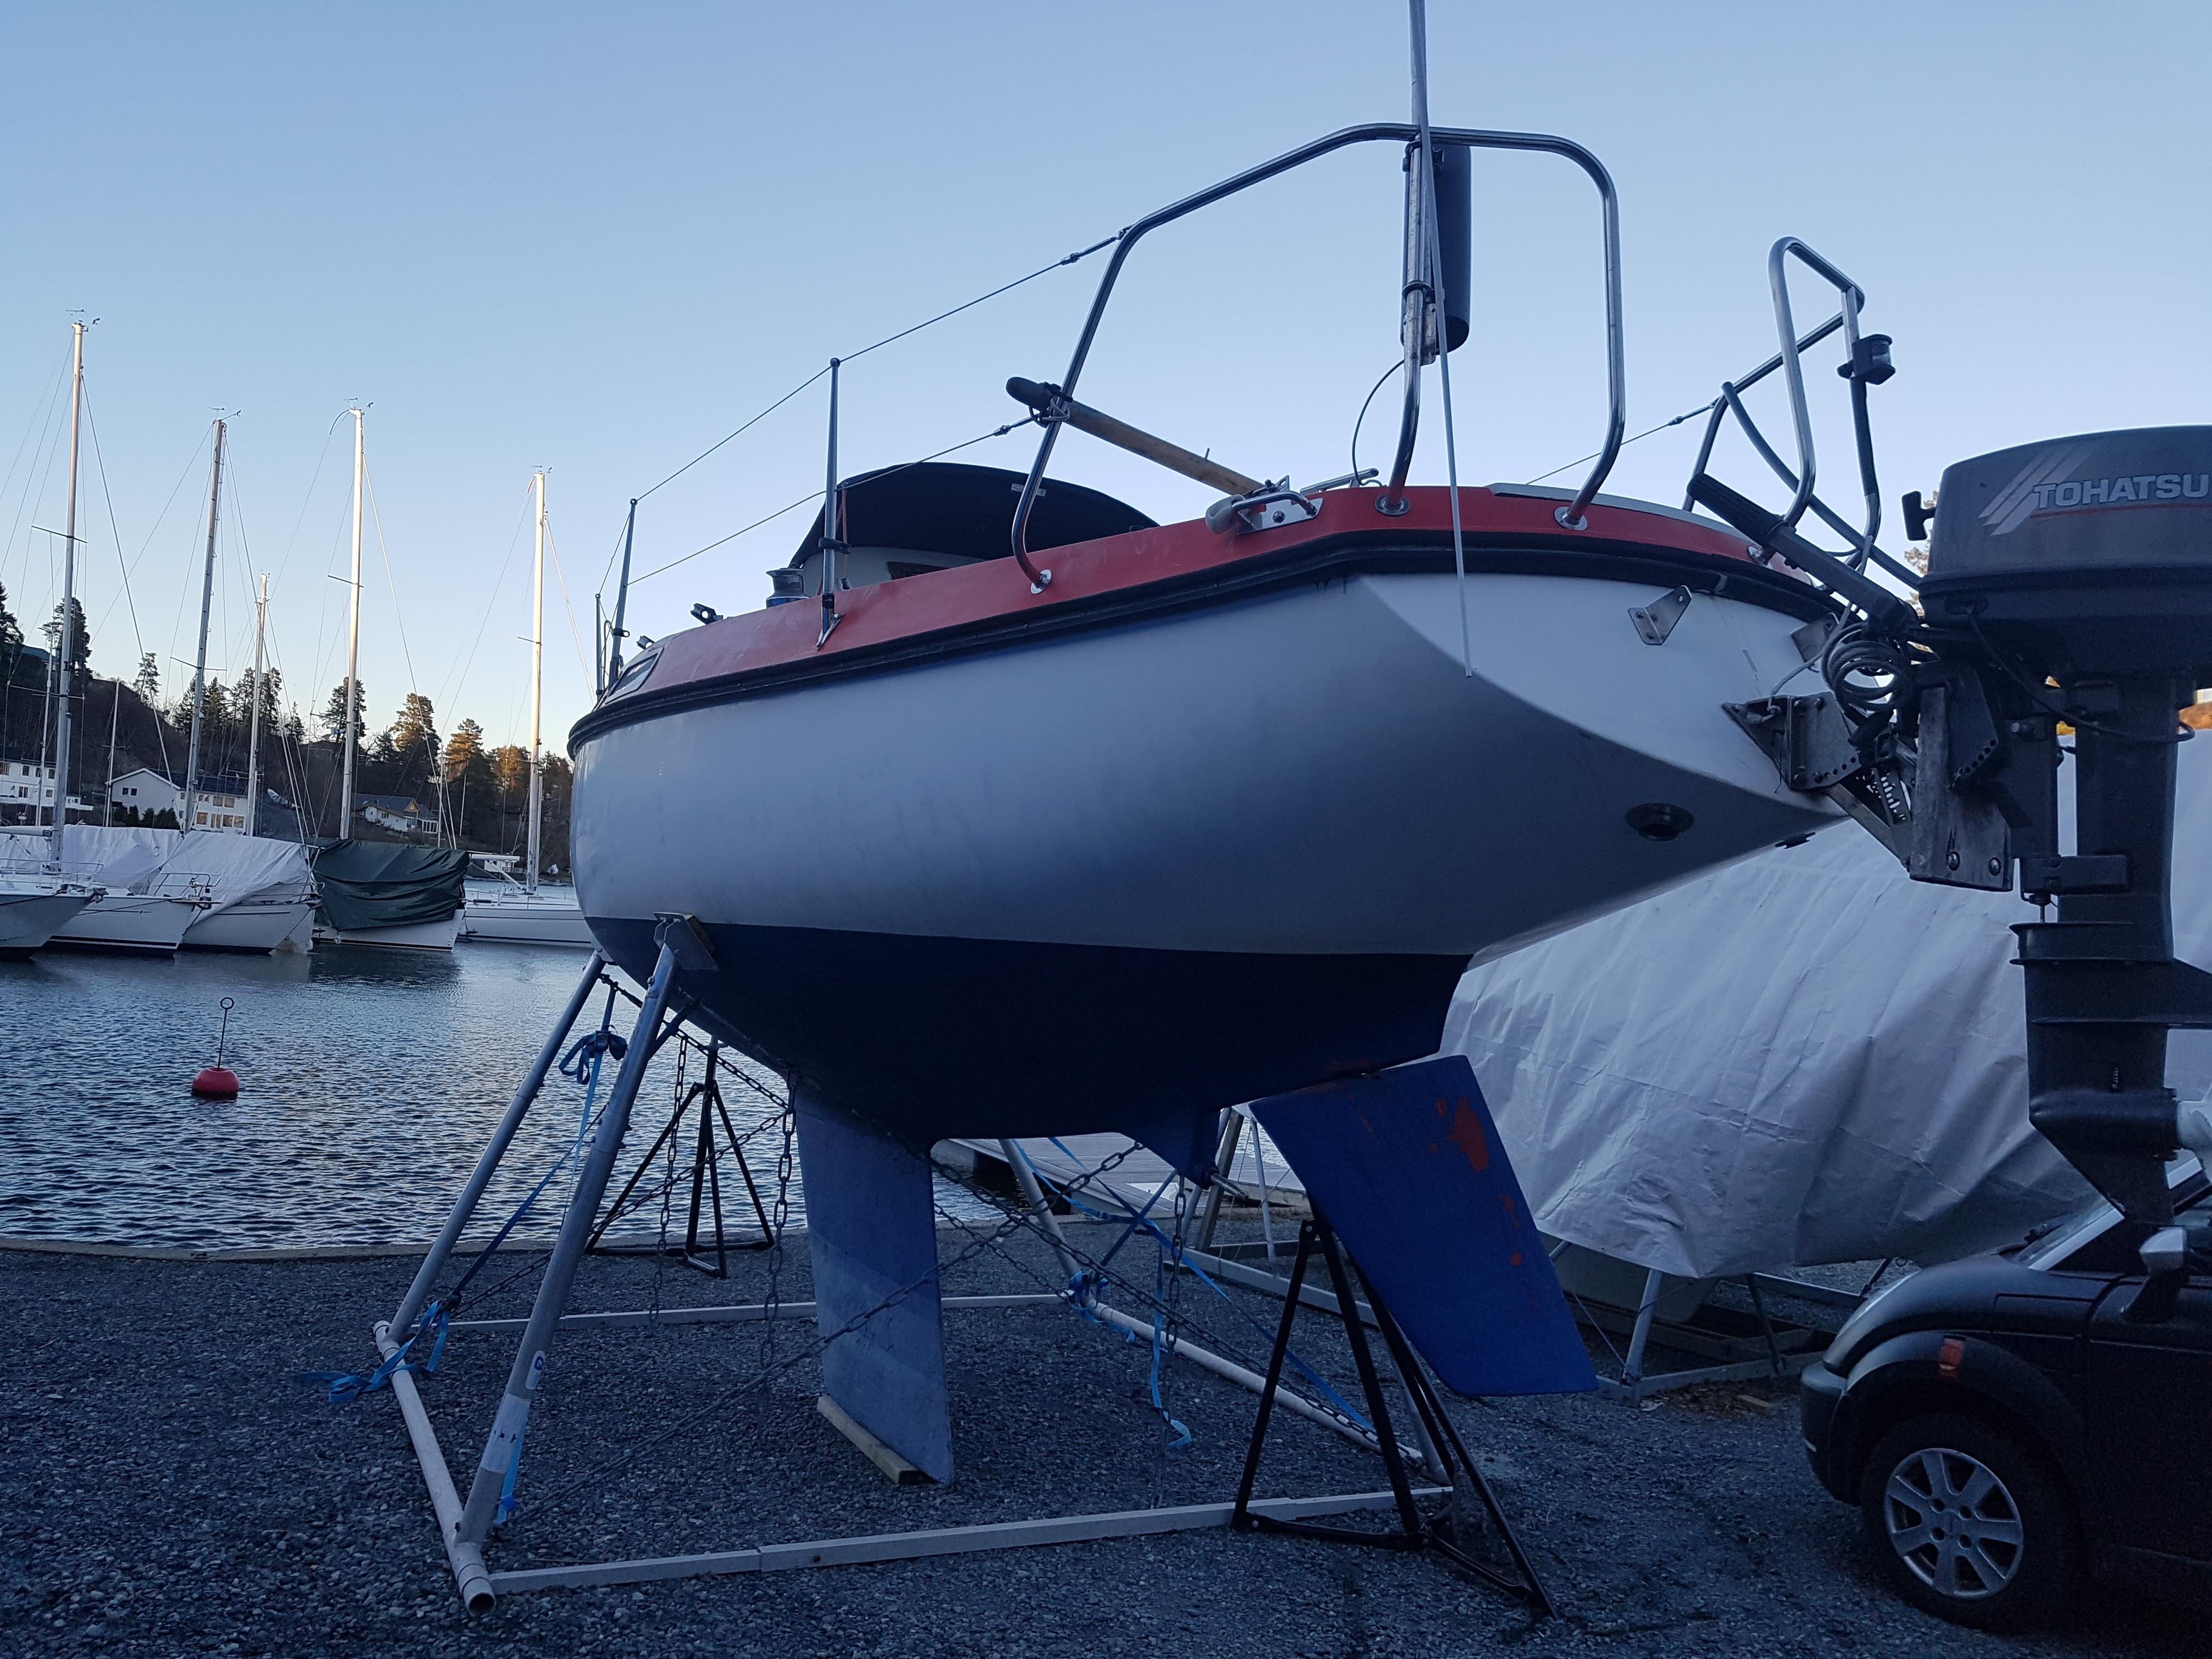 Sejlbåd_-_EV_plan